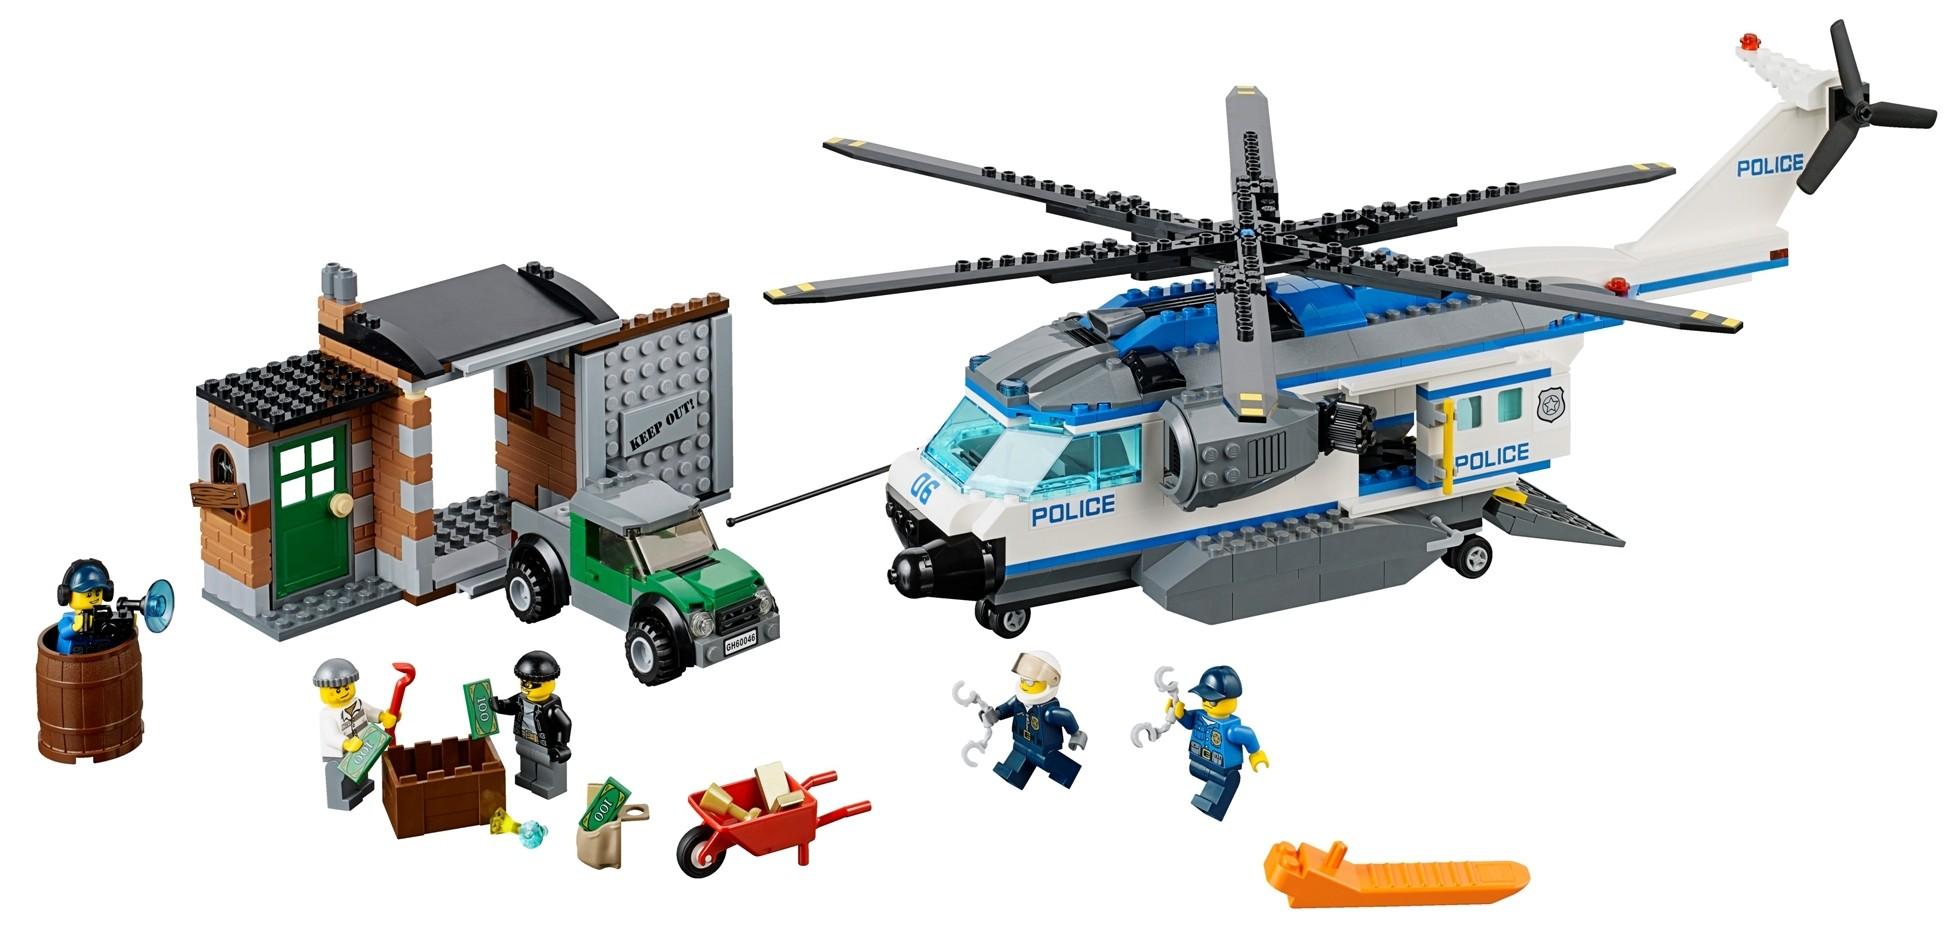 2014 LEGO City Helicopter Surveillance 60046 Set Photos & Preview